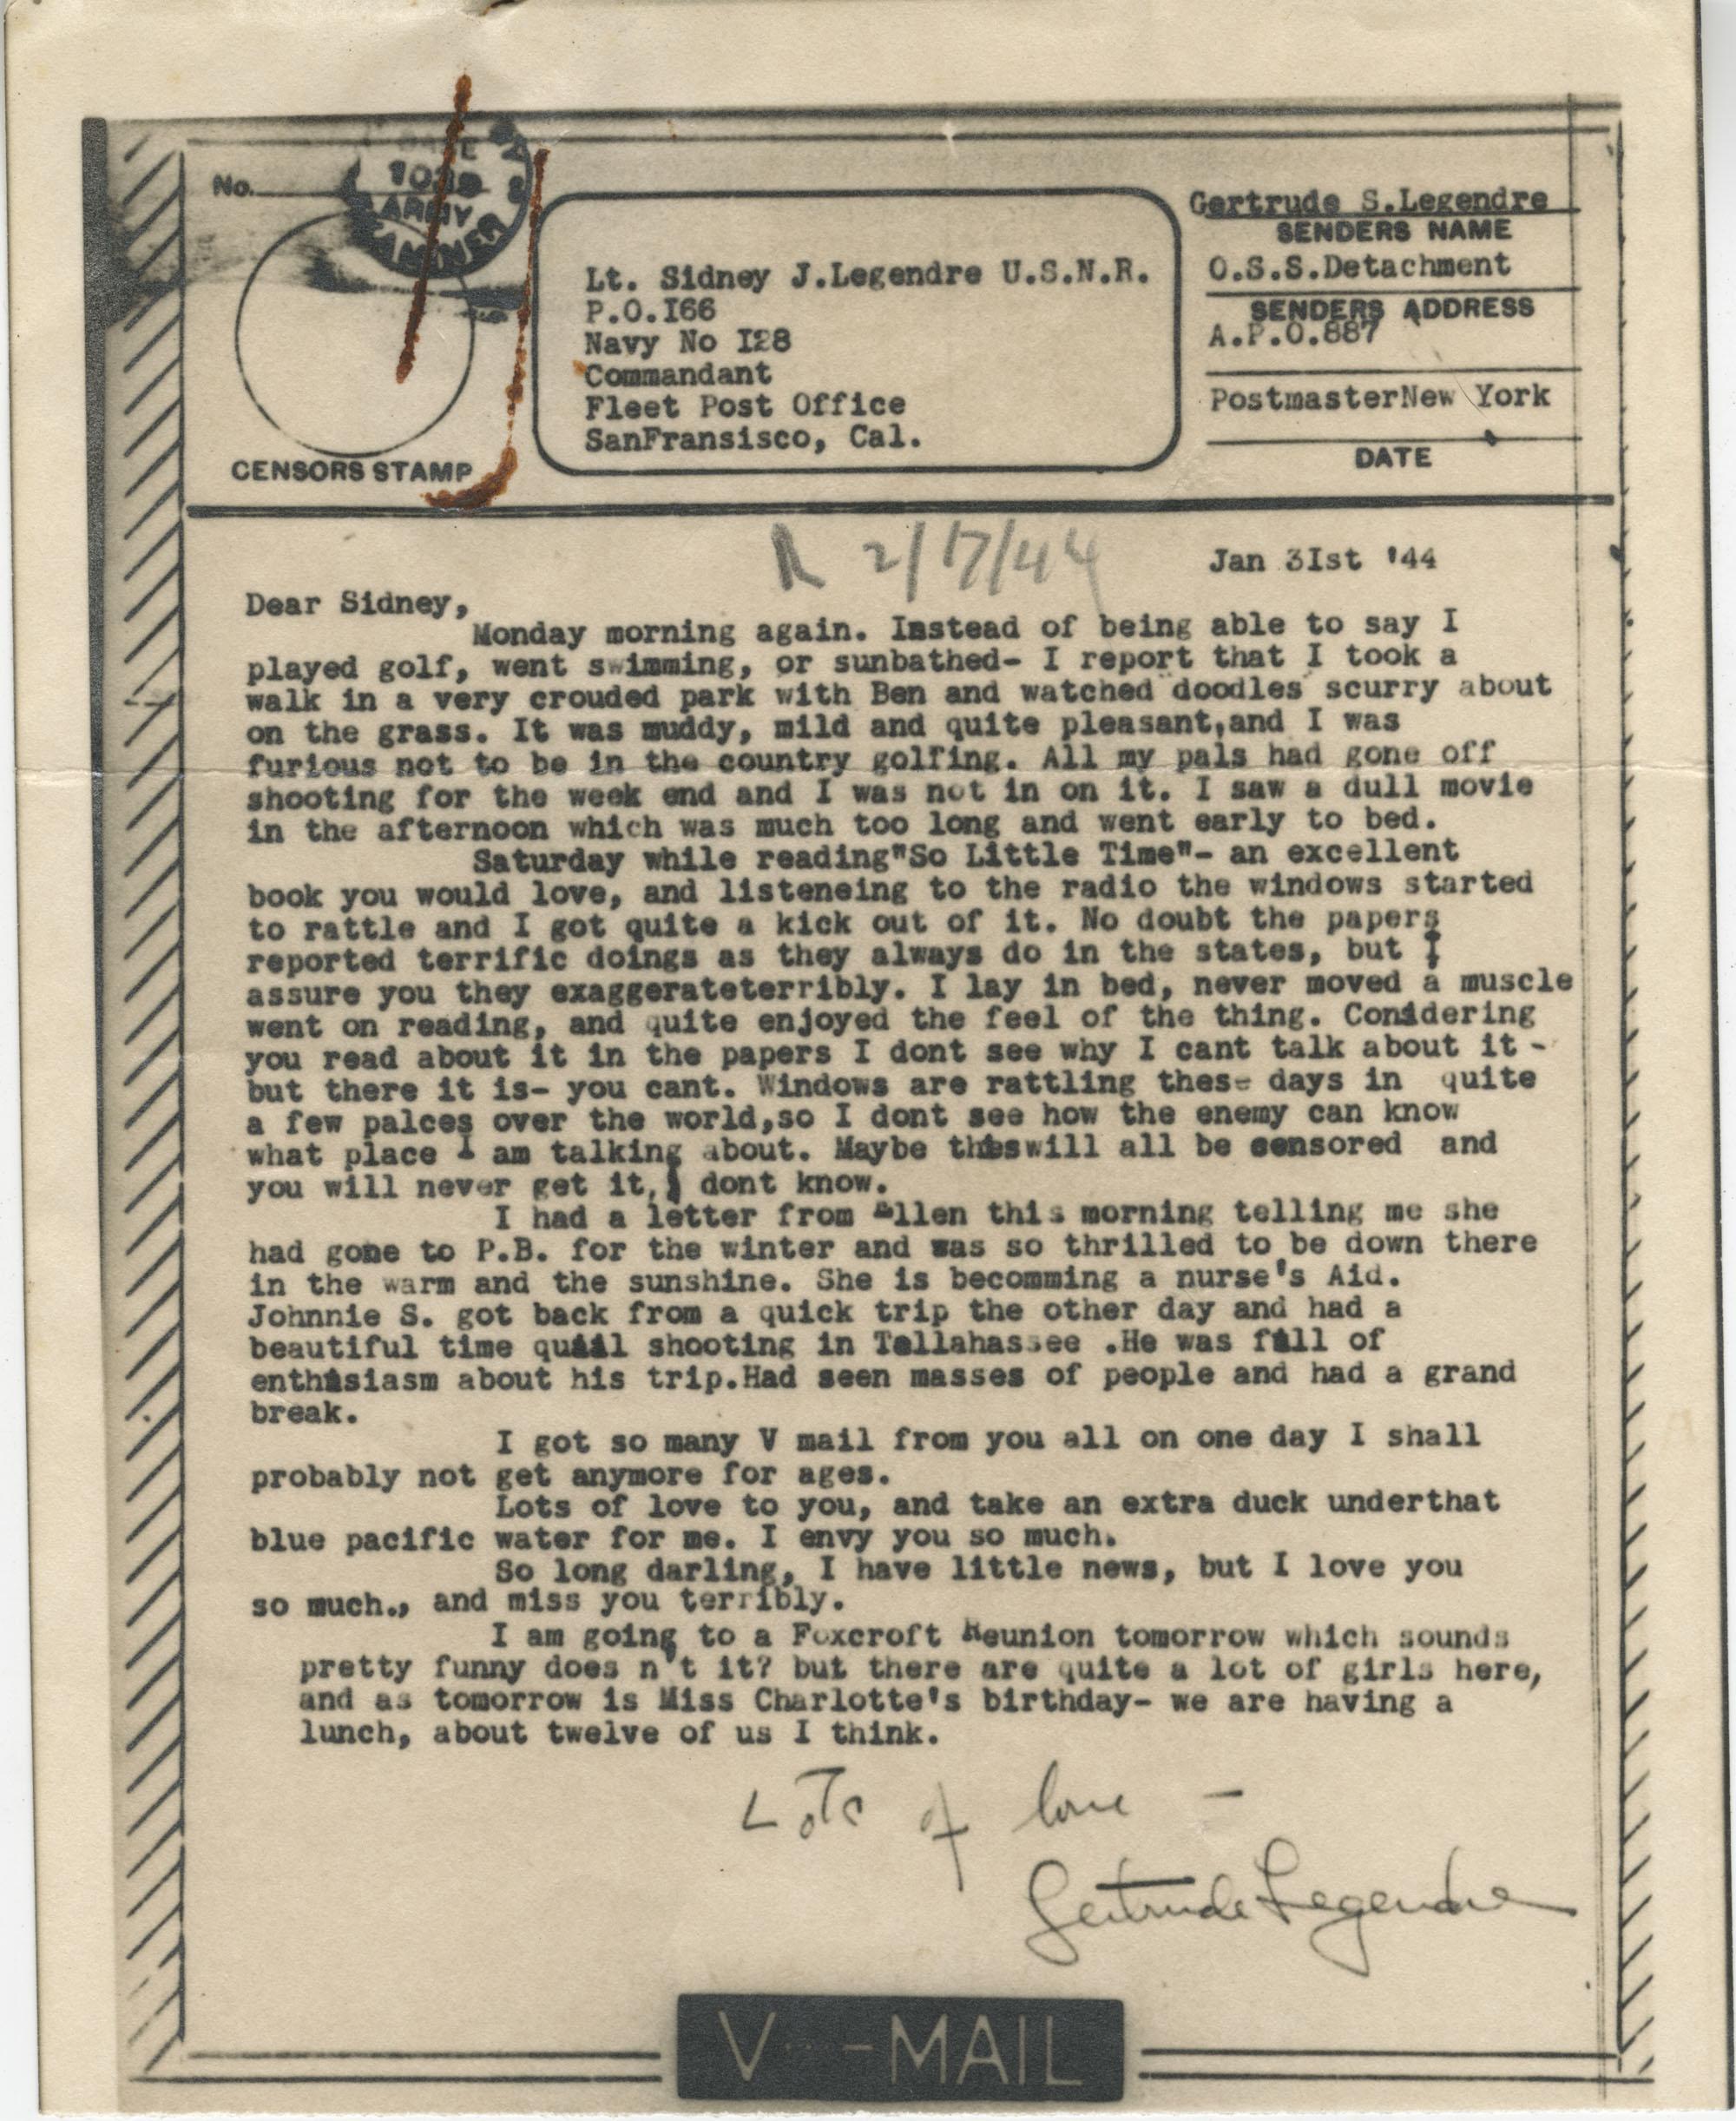 Letter from Gertrude Sanford Legendre, January 31, 1944